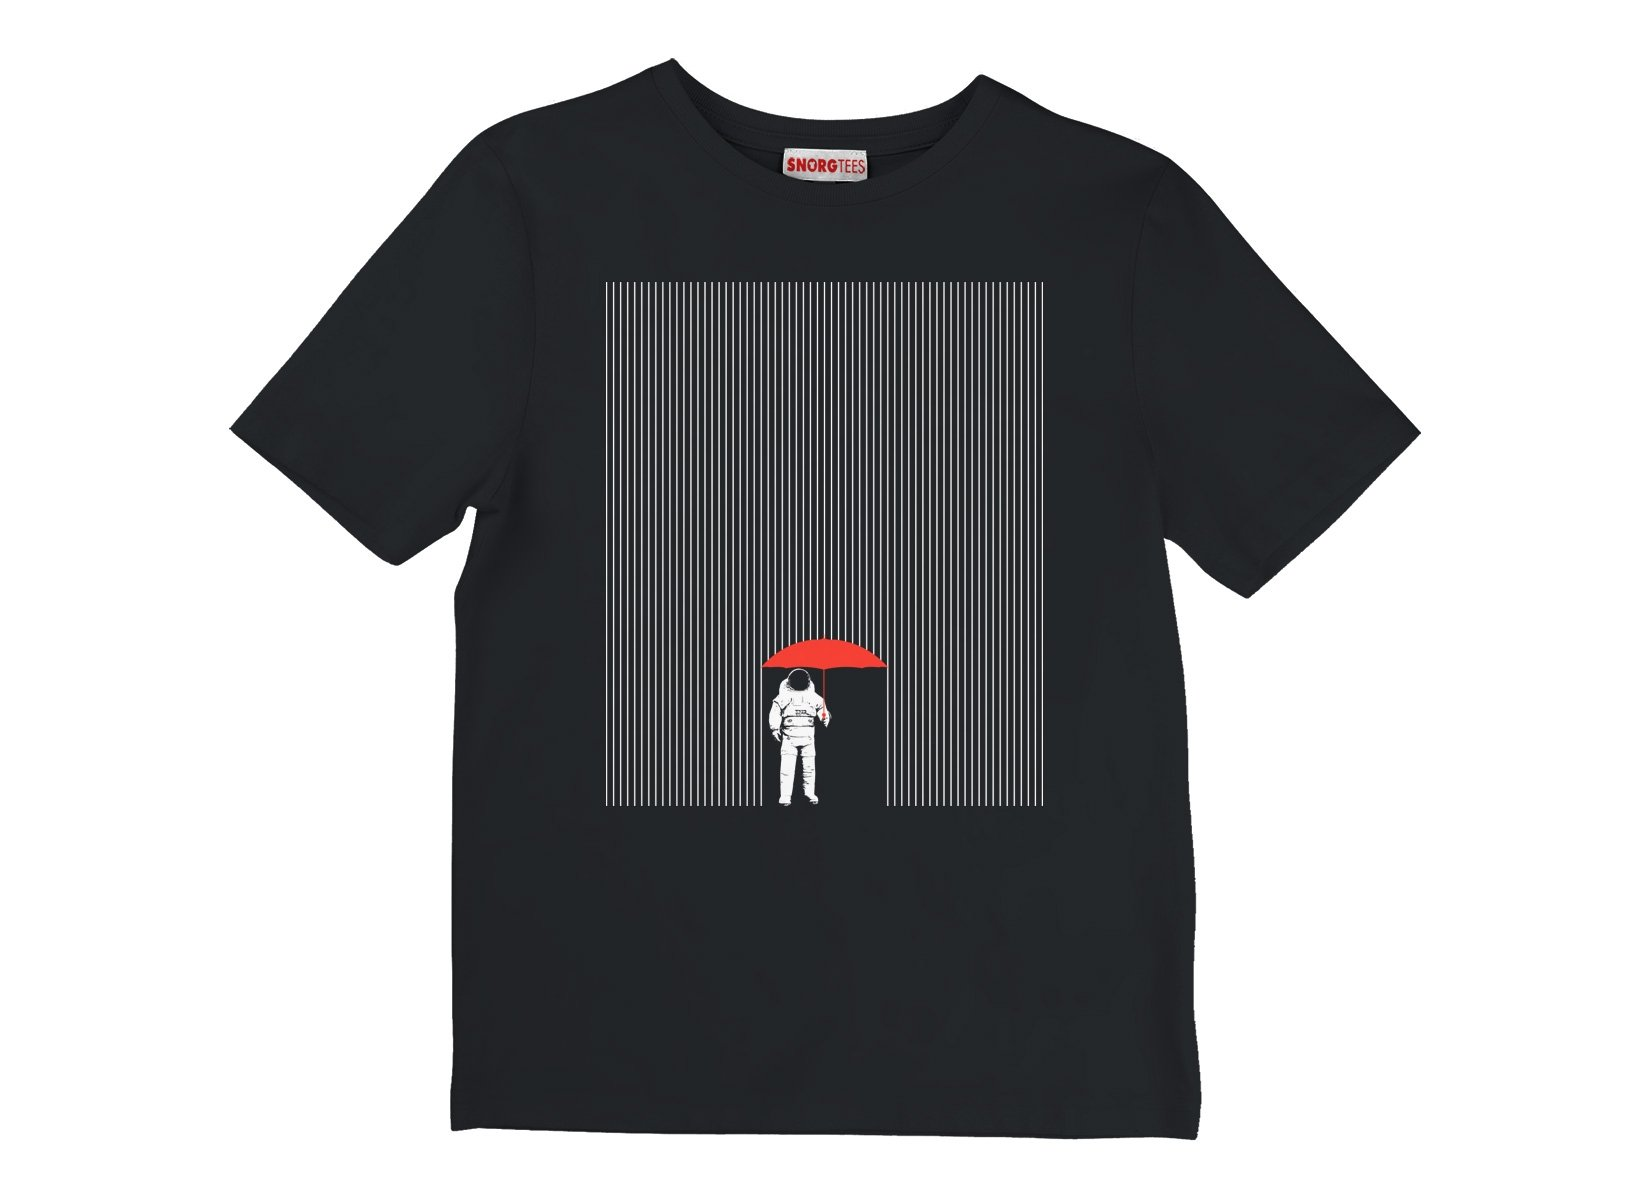 Meteor Shower on Kids T-Shirt